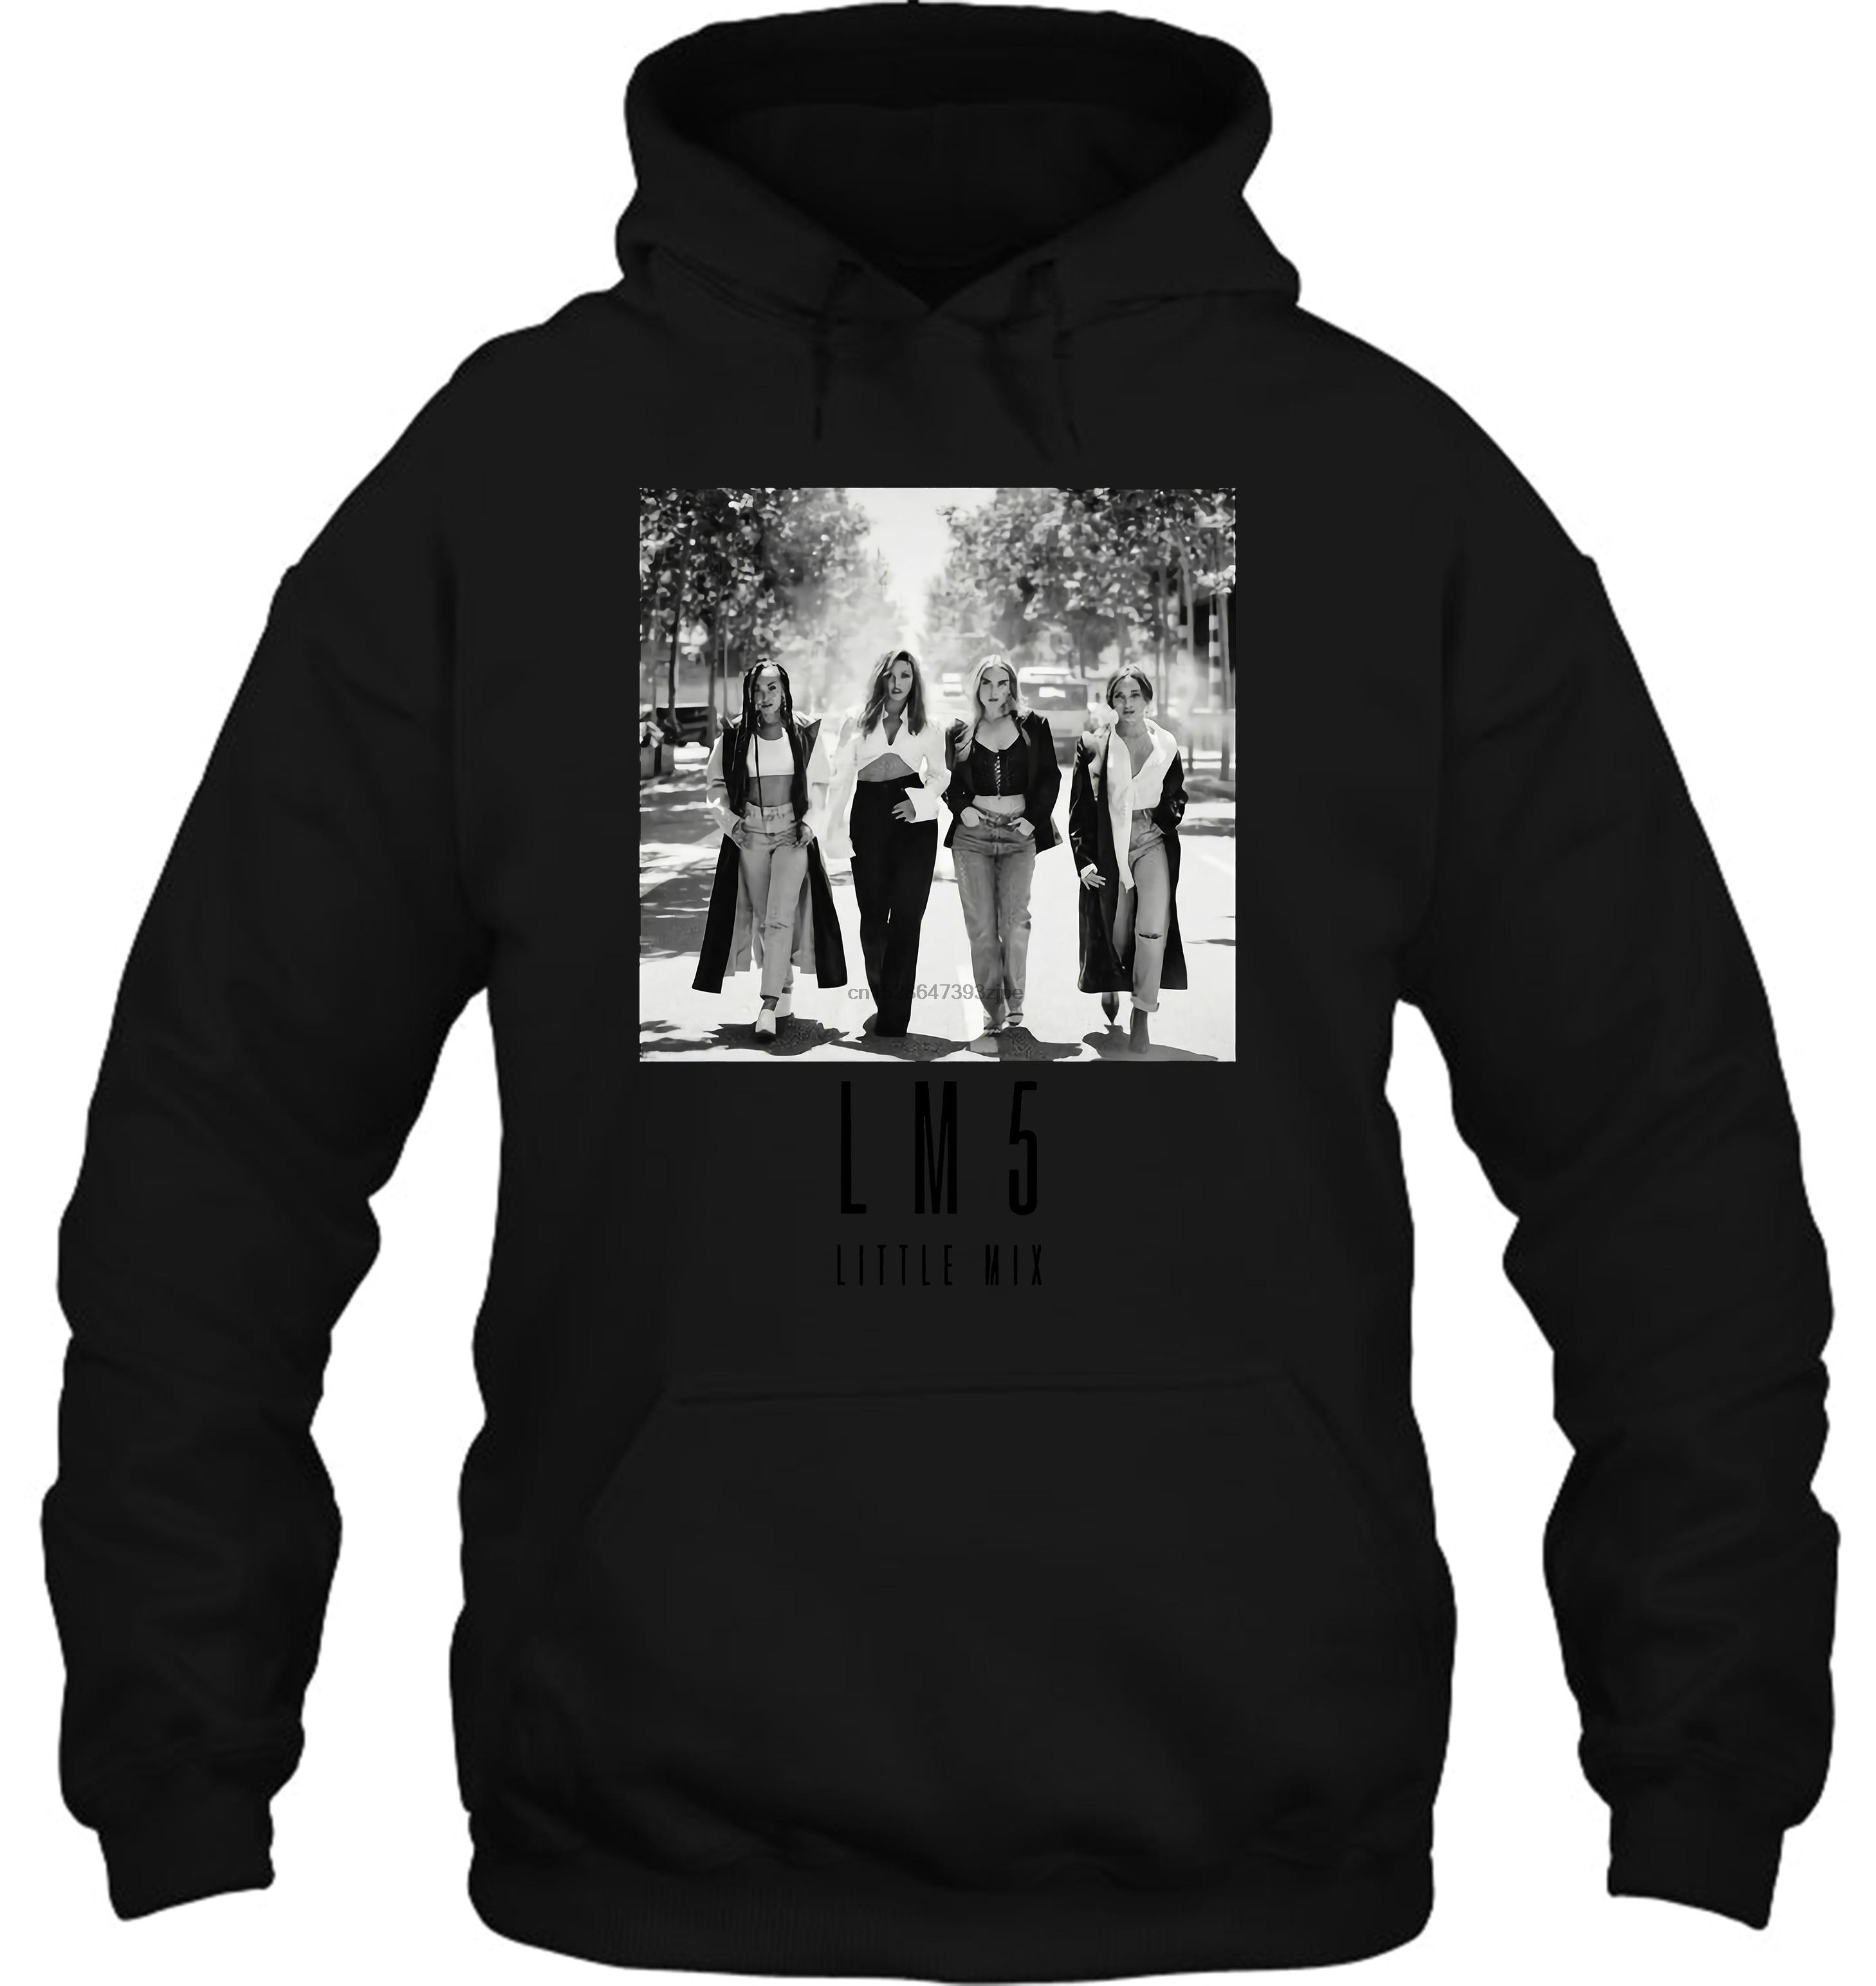 Little Mix LM5 Tour 3colors S XXL Streetwear Men Women Hoodies Sweatshirts